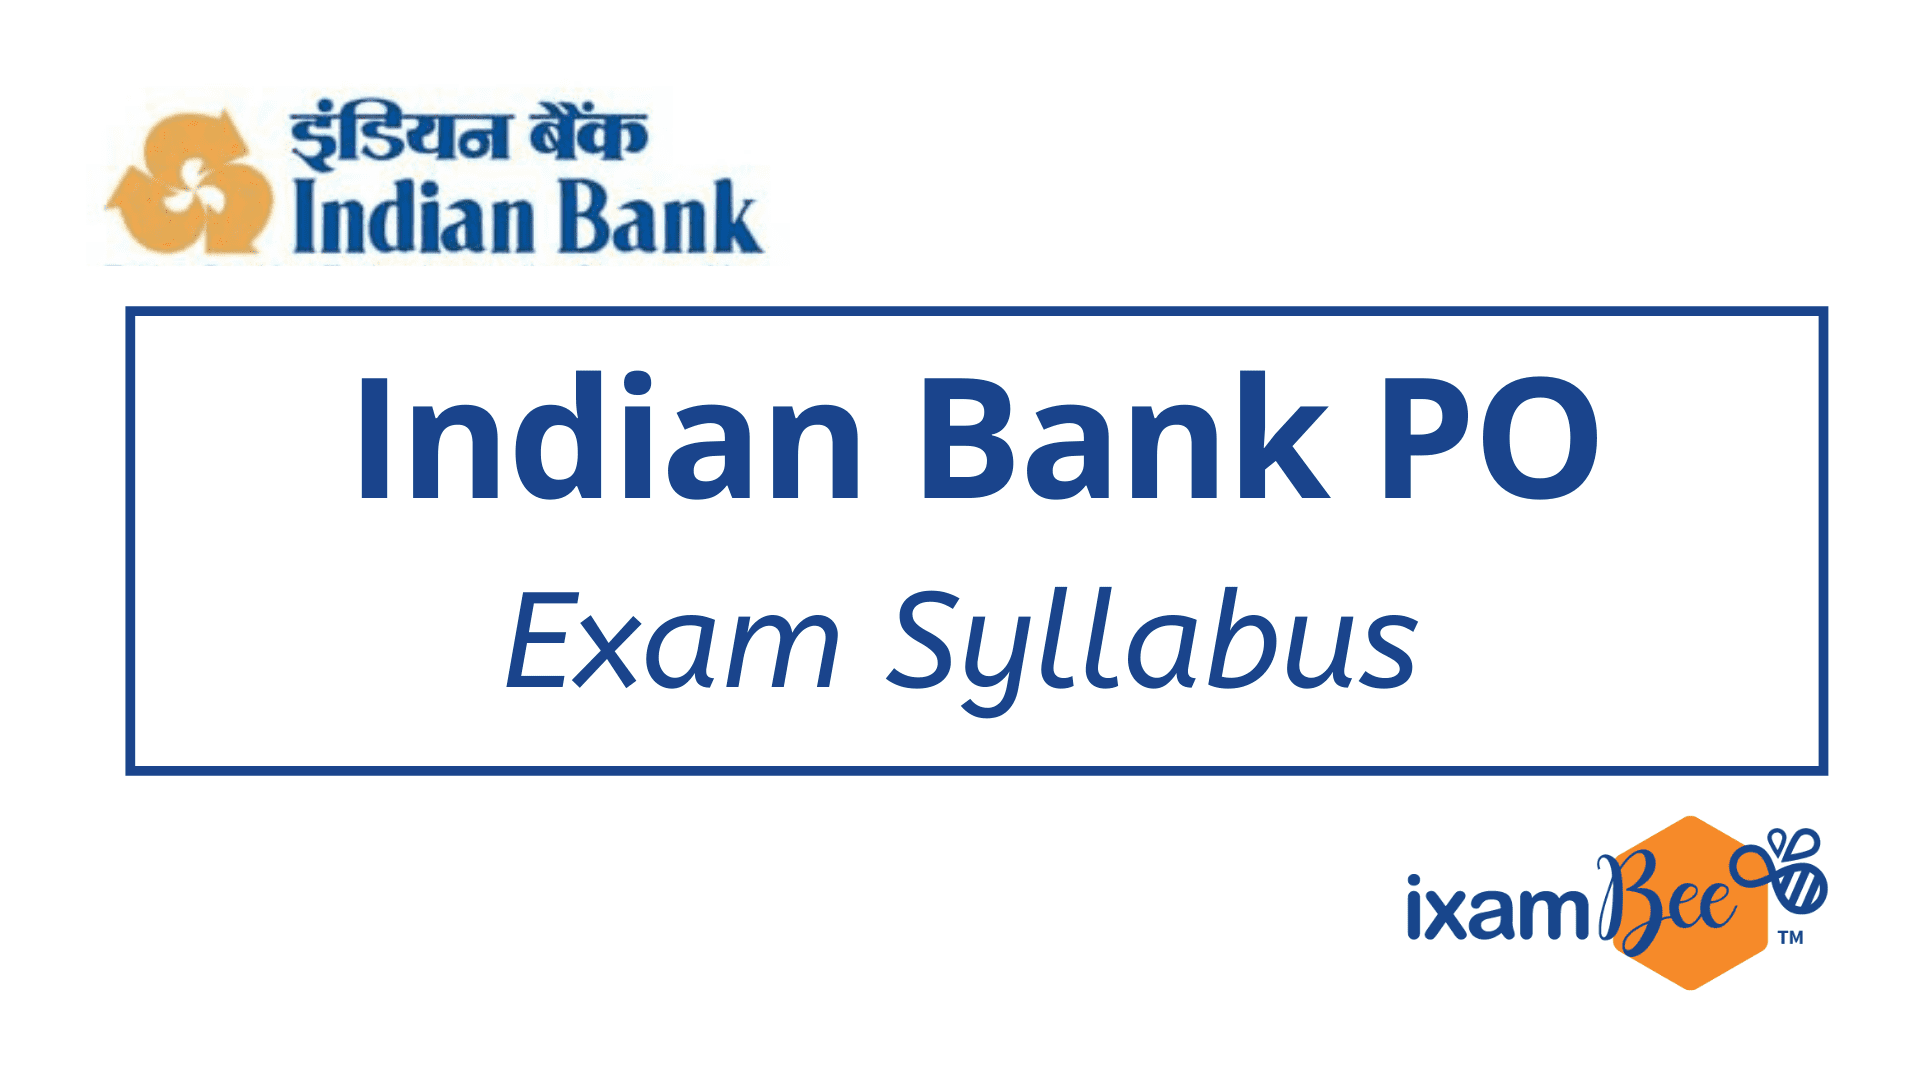 Indian Bank PO Exam Syllabus